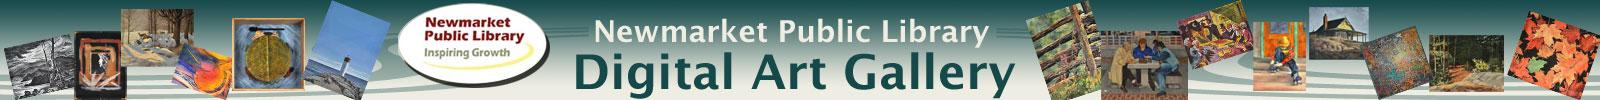 Newmarket Public Library - Digital Art Gallery